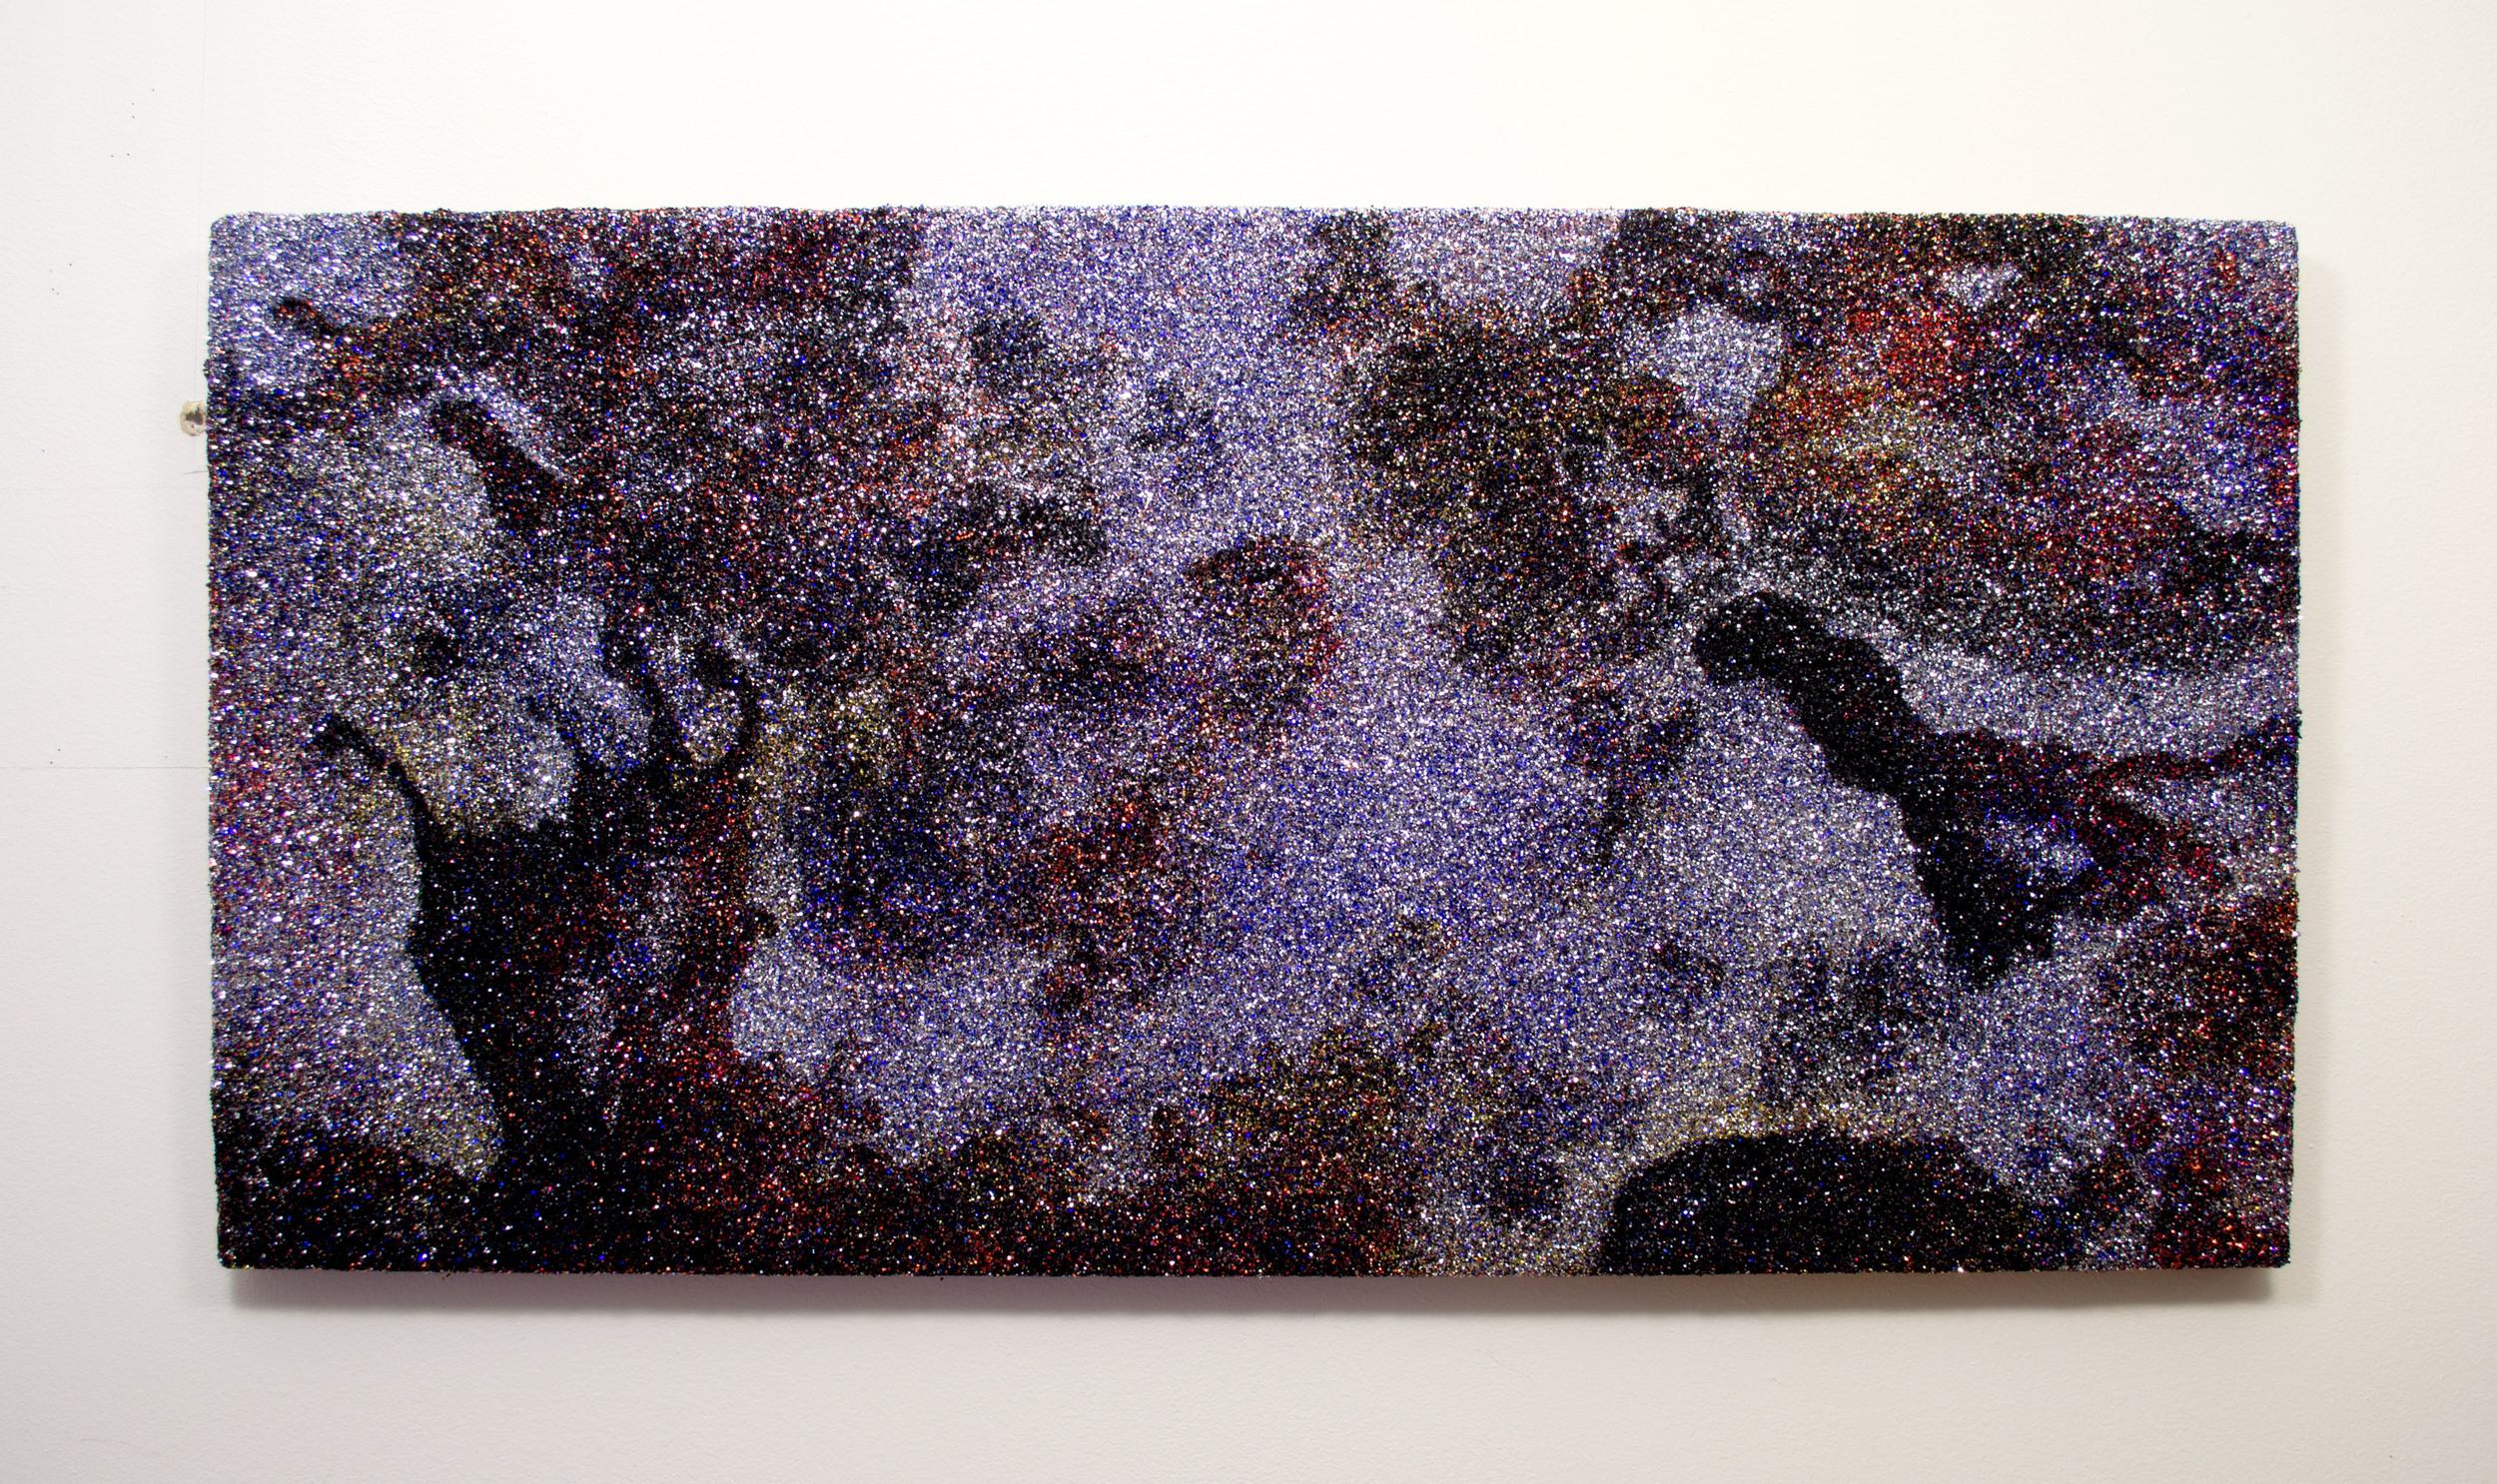 """Dust Pillars in the Carina Nebula"